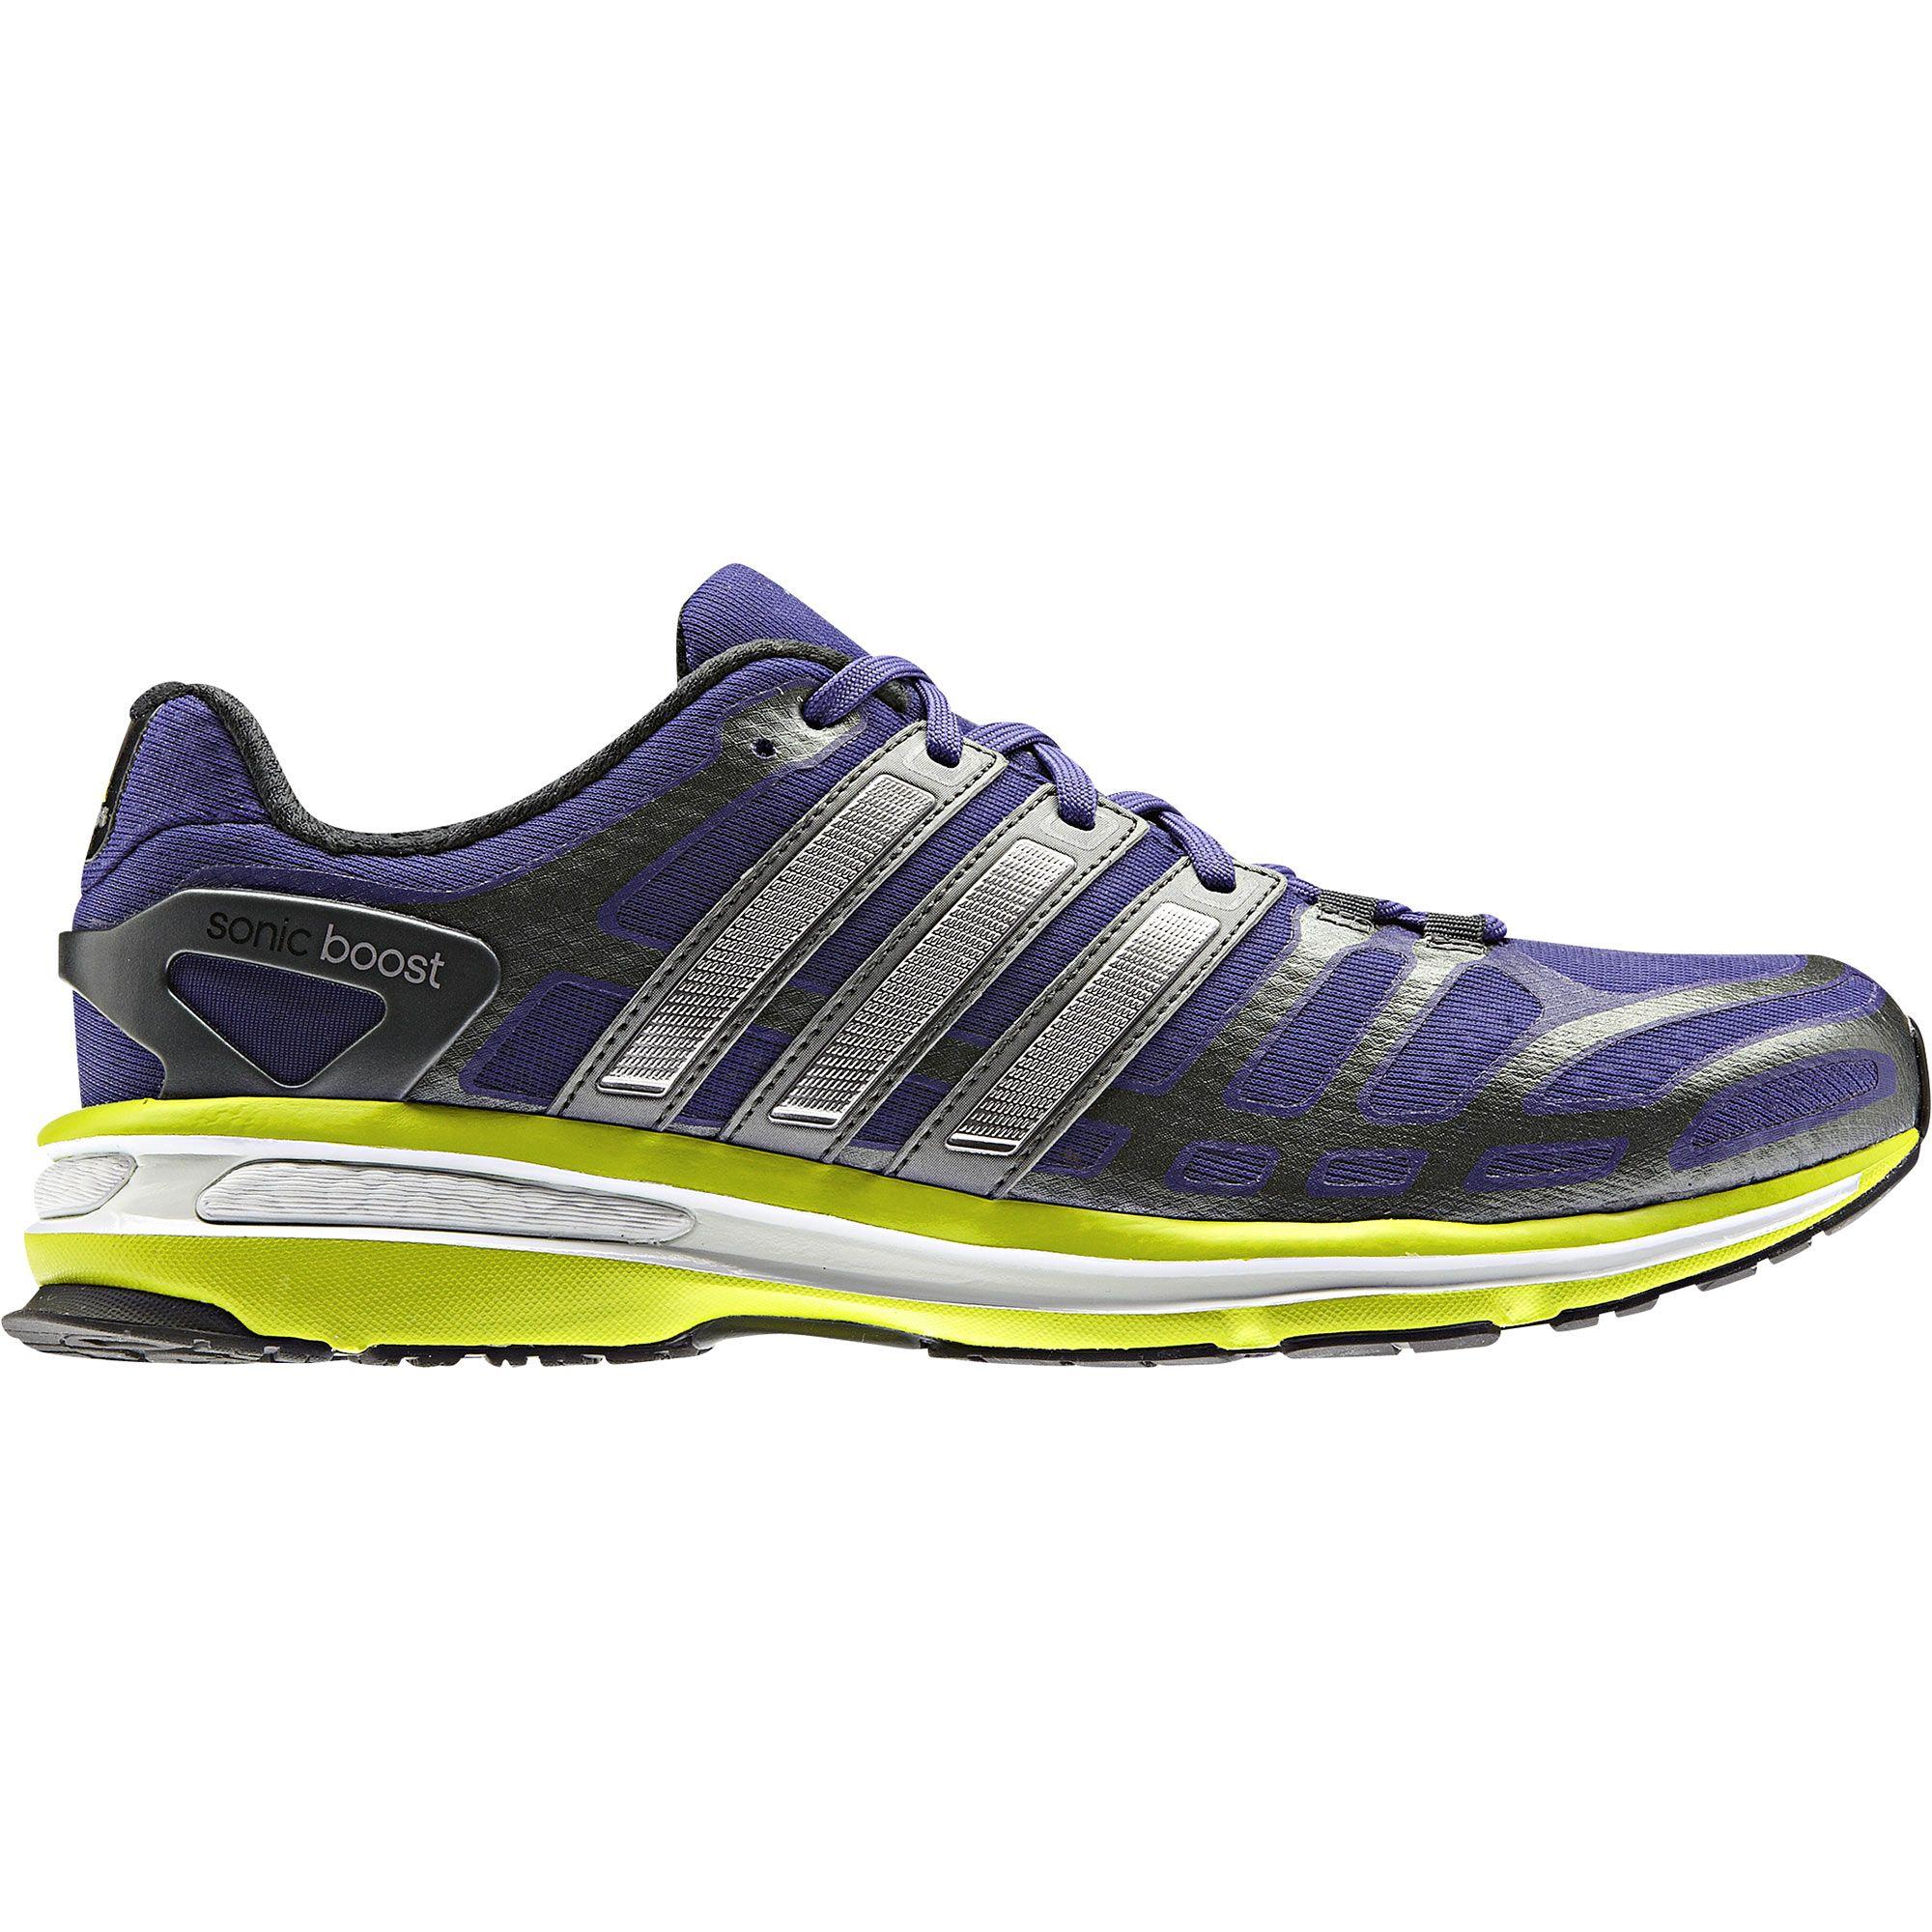 Adidas Women s Sonic Boost Shoes  e5ad3514f0f8